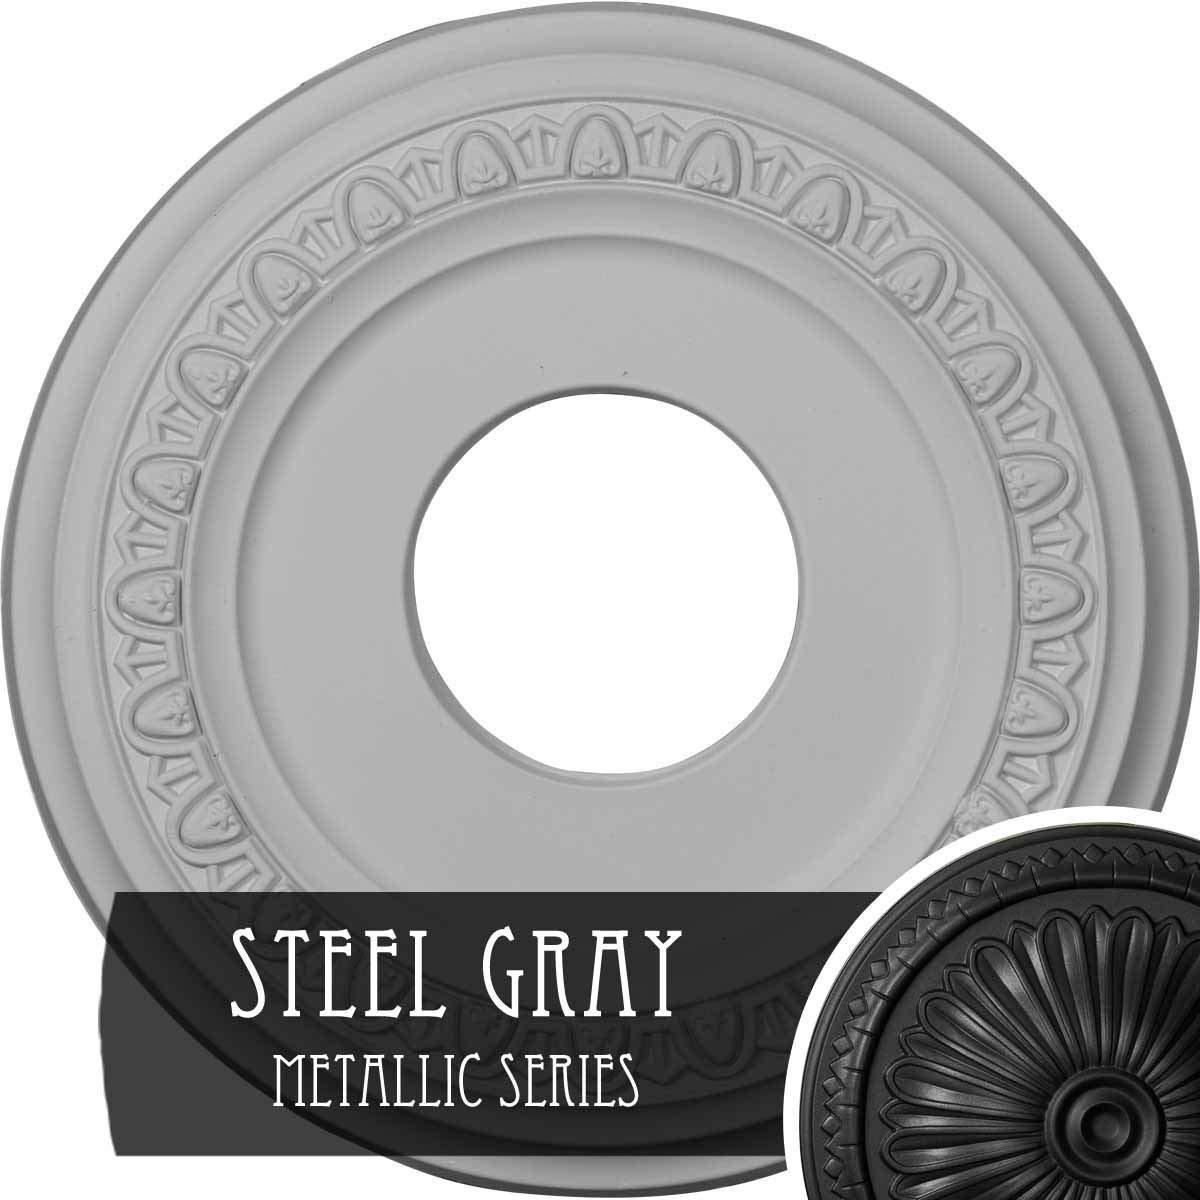 Ekena Millwork CM12JASGS 12 1/4'' OD X 4'' ID X 1 1/8'' P Jackson Ceiling Medallion fits Canopies up to 7 3/8'', Steel Gray